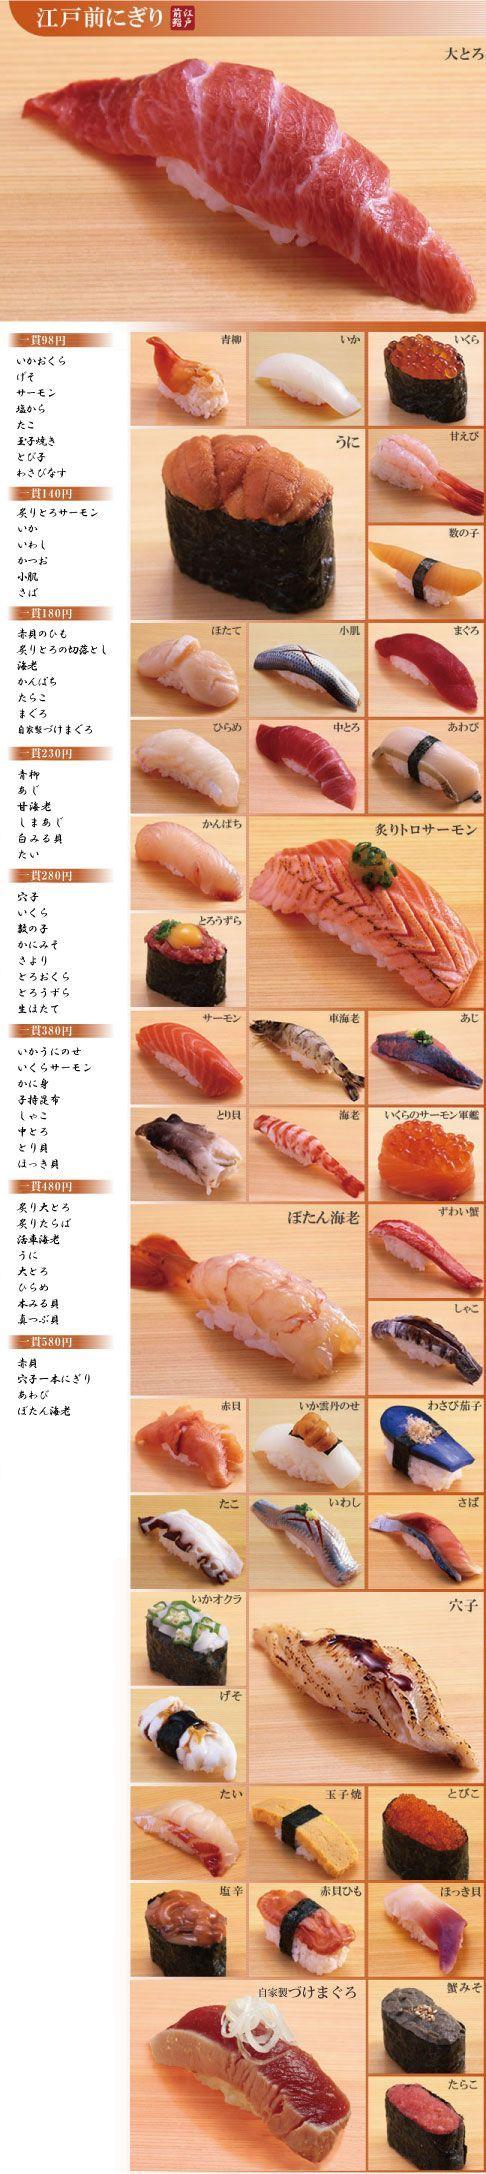 Sushi Cascade: Edomae Nigiri Sushi Menu at Tsukiji Tamasushi (Tokyo, Japan)|築地玉寿司の江戸前にぎり: